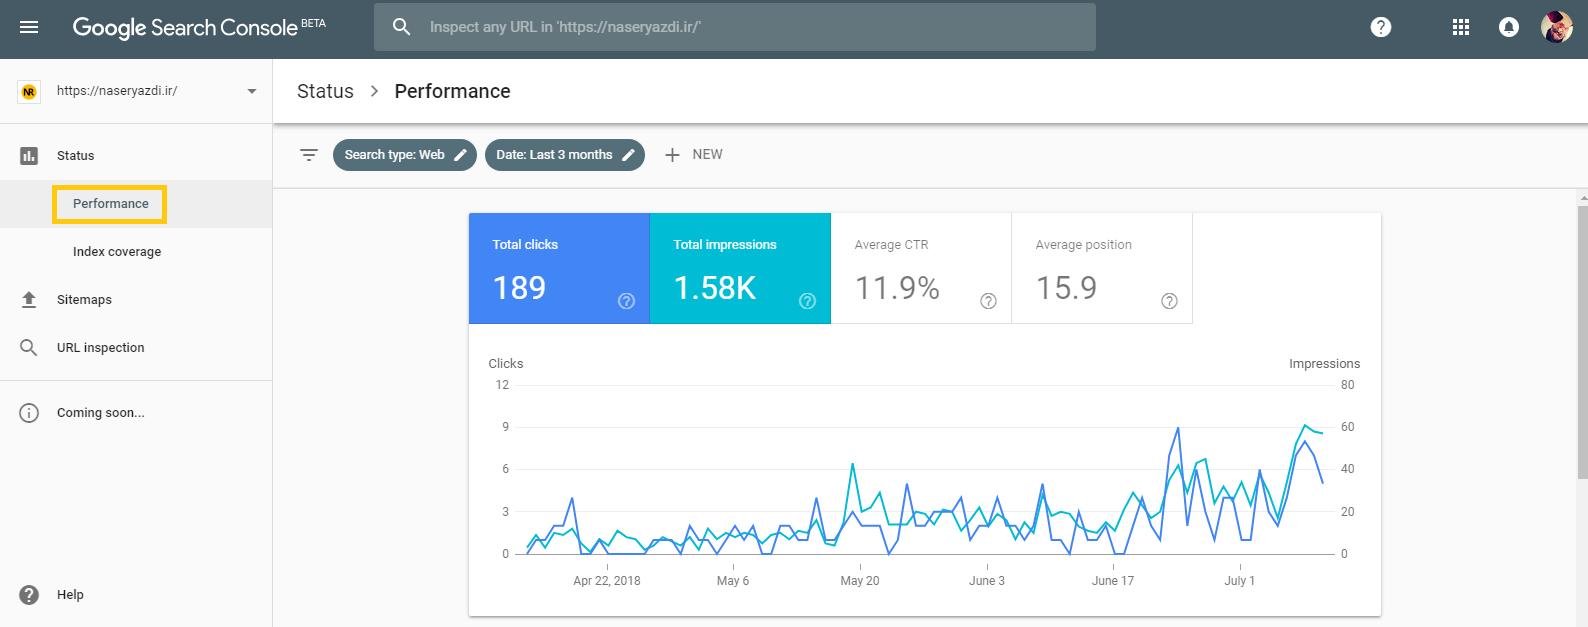 گزارش عملکرد در گوگل سرچ کنسول Performance Report